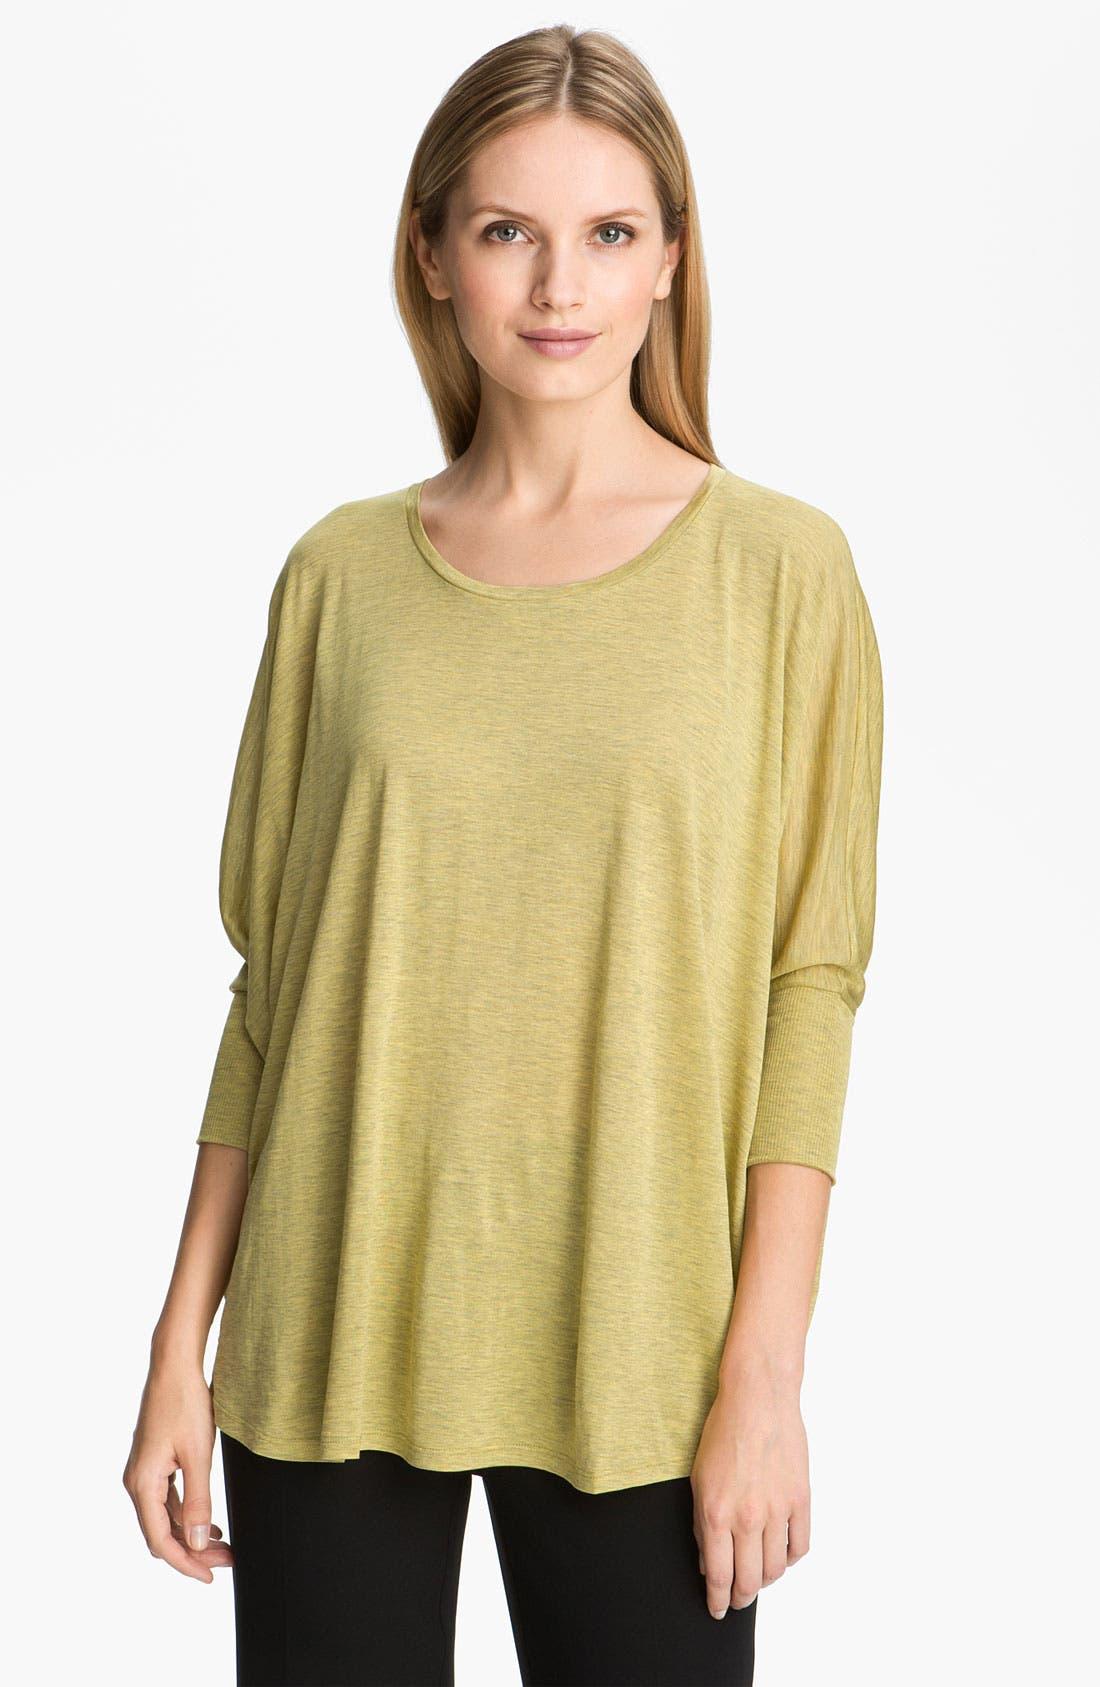 Main Image - Eileen Fisher Silk & Cotton Jersey Top